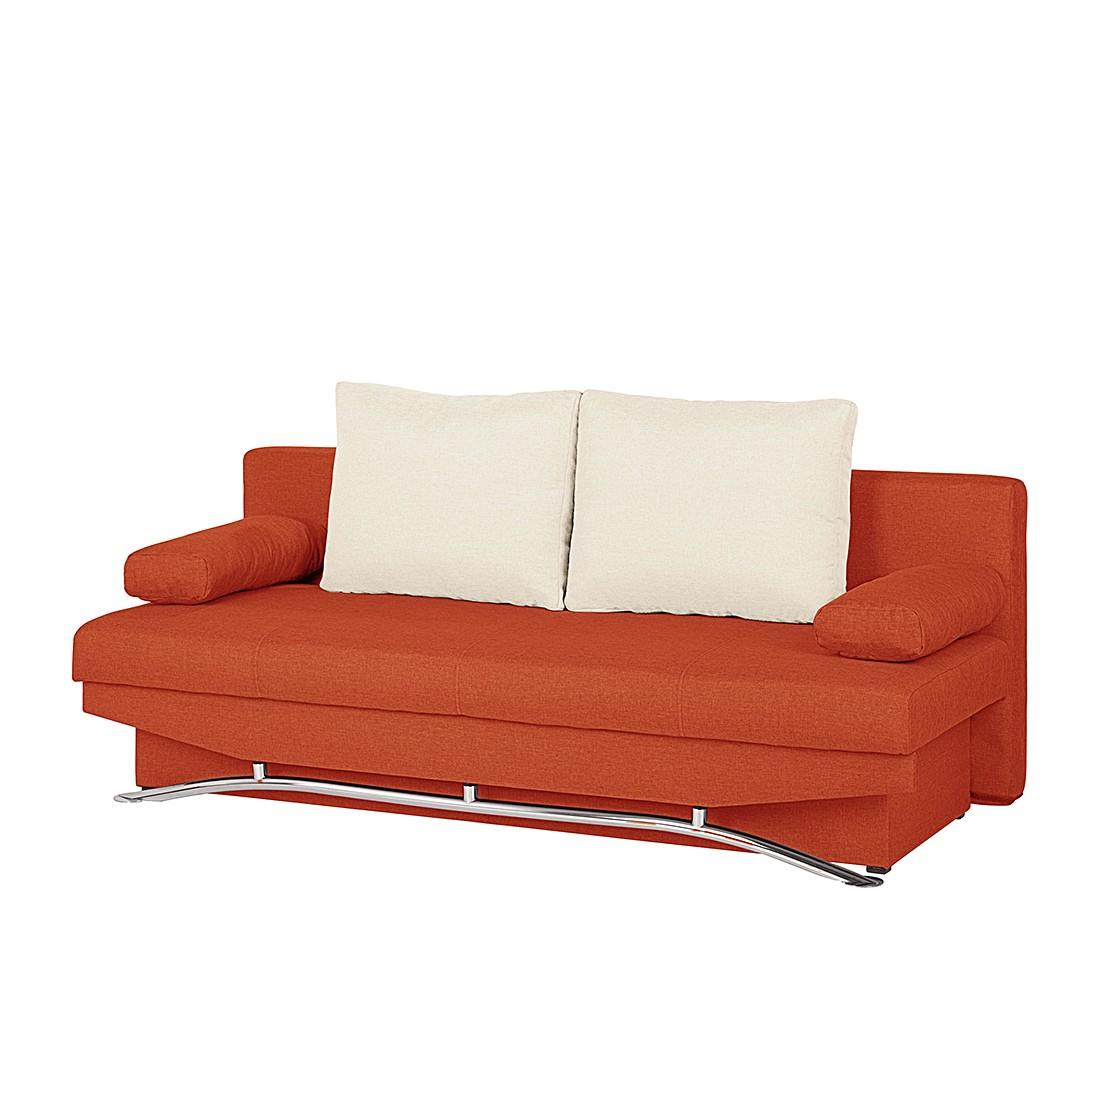 Schlafsofa Lenni – Webstoff Orange, mooved online bestellen